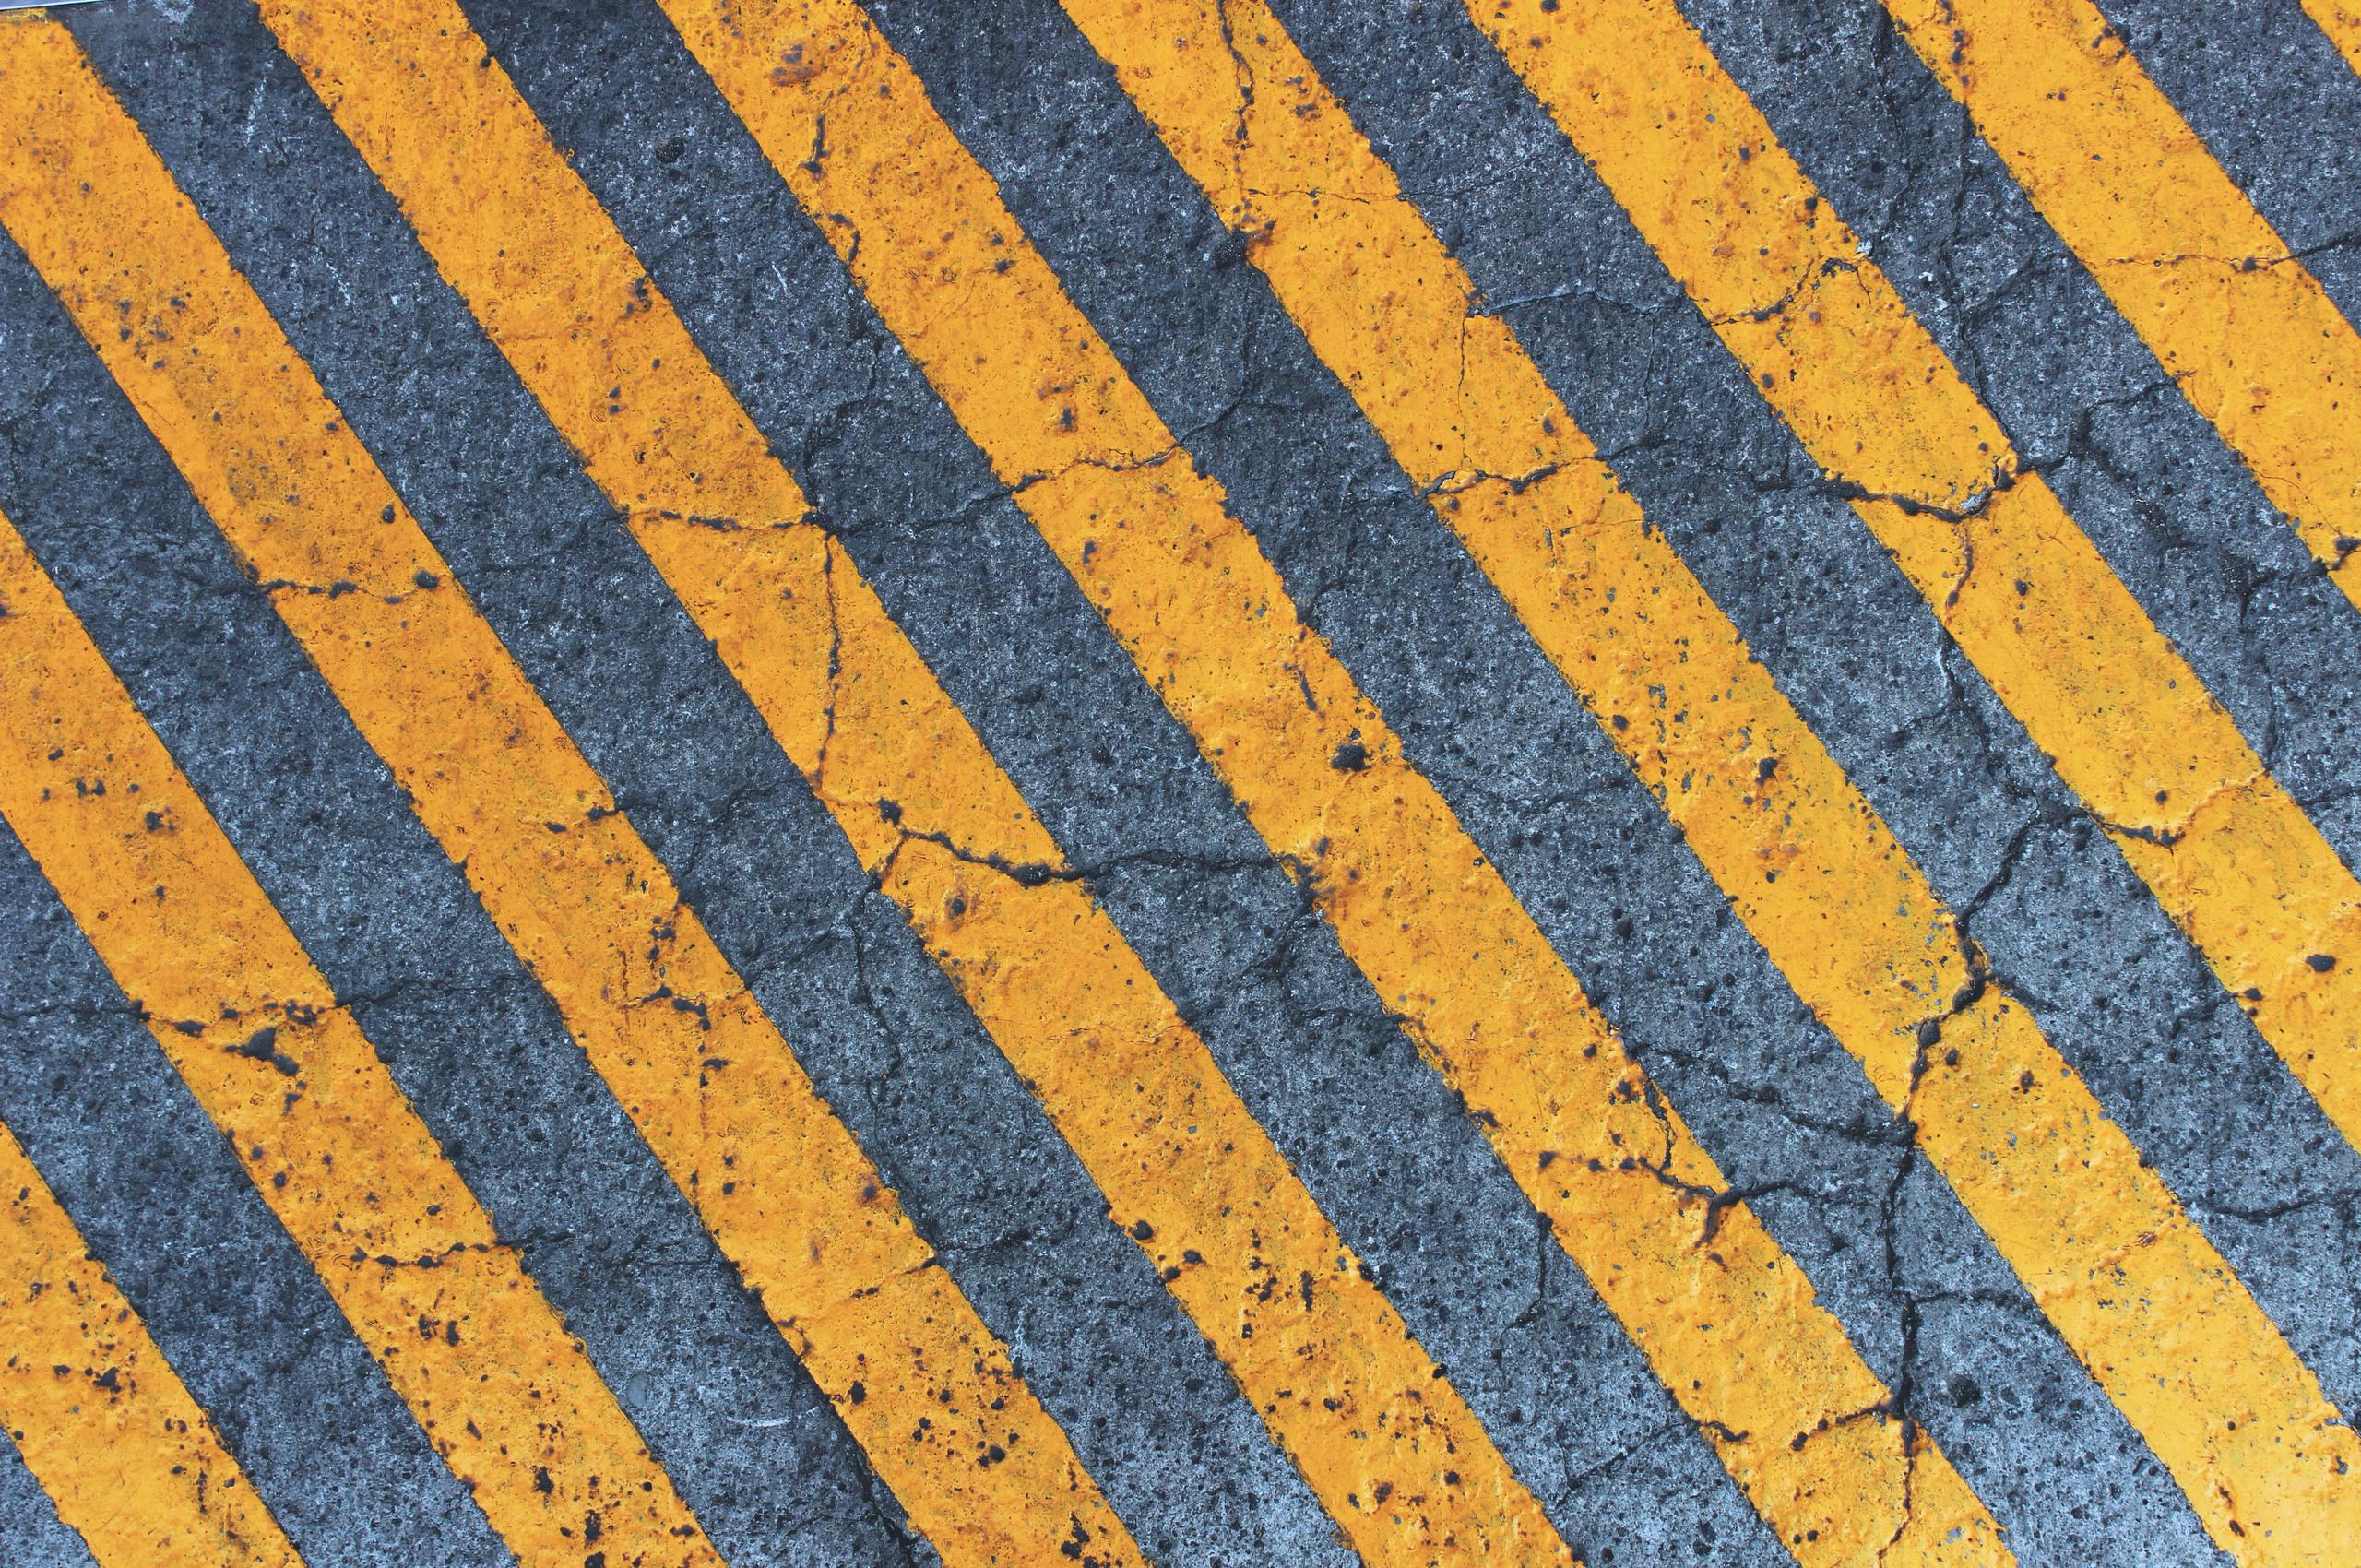 road-diagonal-abstract-5k-2t.jpg